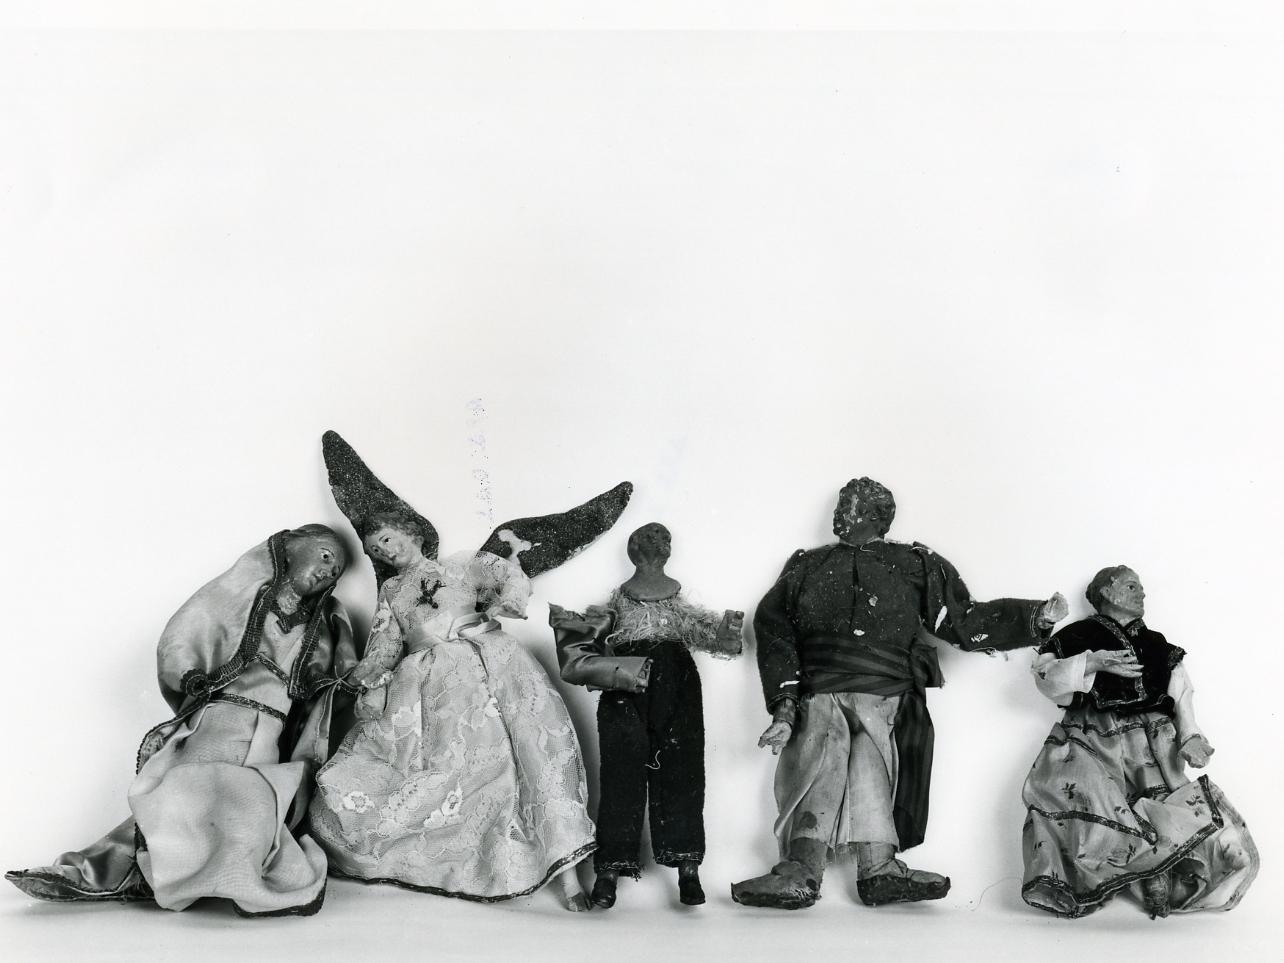 statuetta di presepio, insieme - bottega napoletana (fine sec. XIX)